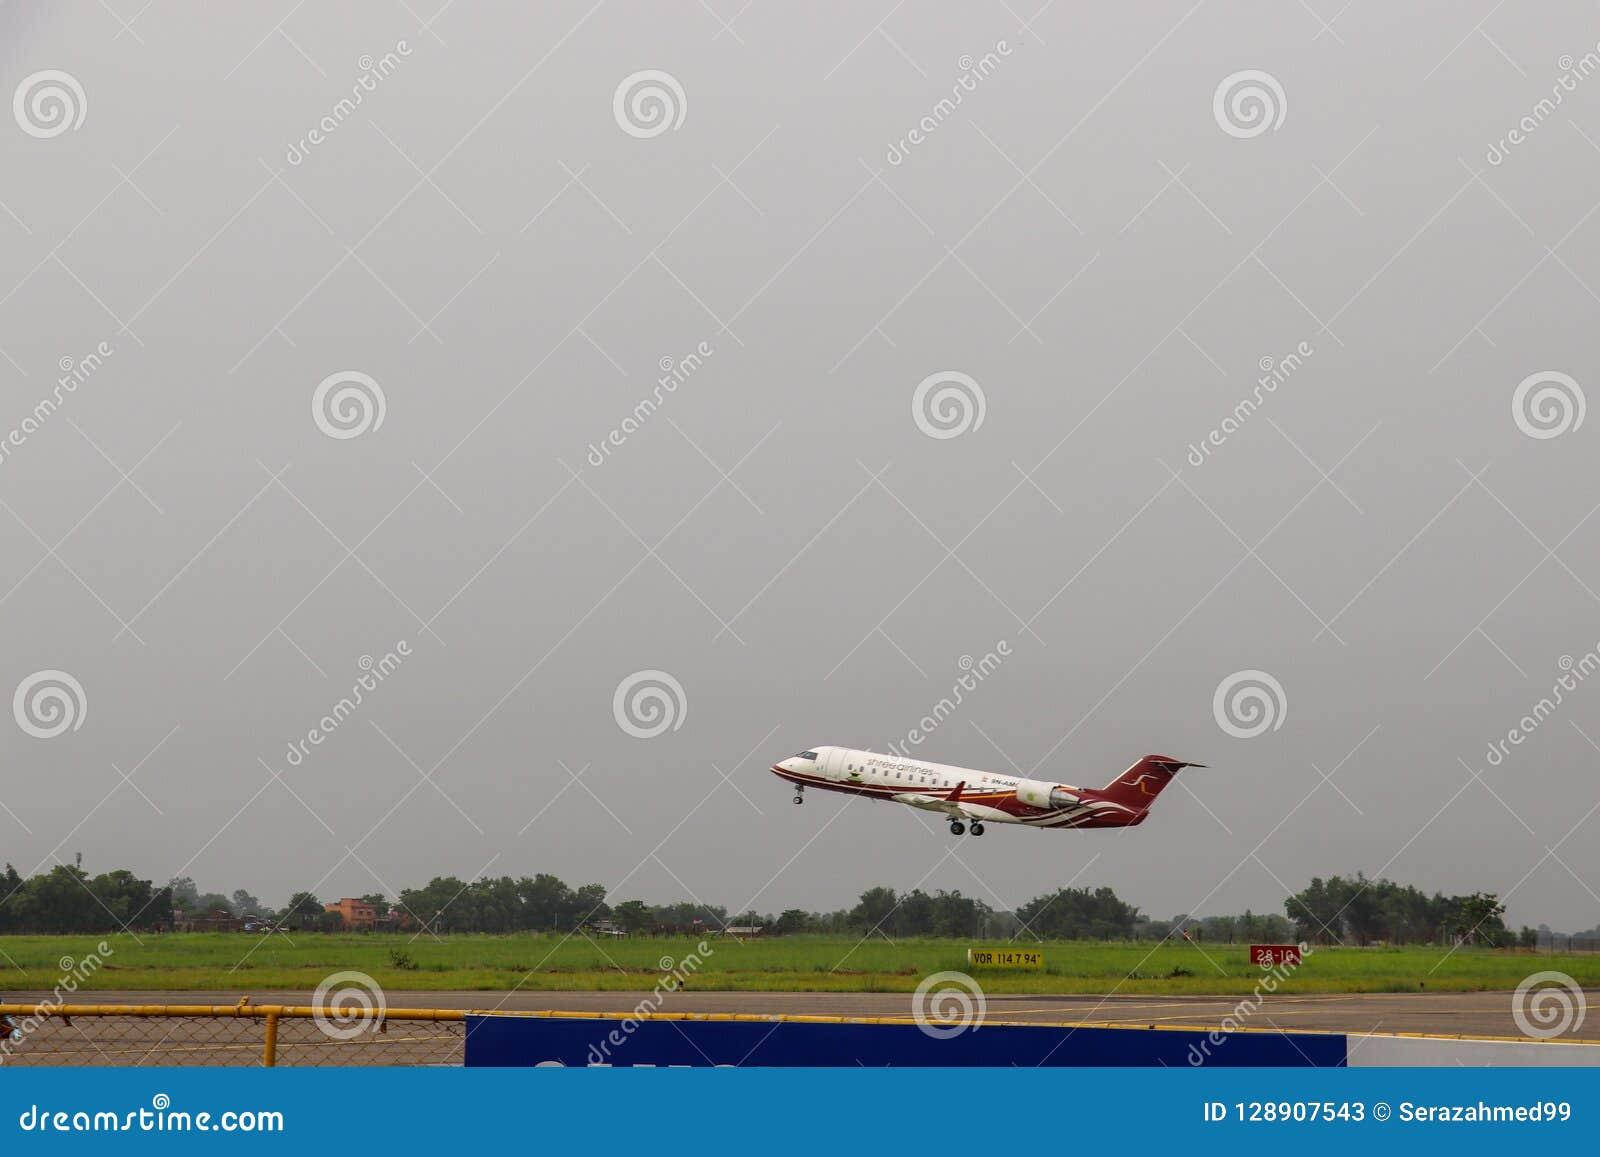 Shree Arirlines Bombardier CRJ200ER aircraft taking-off from Gautam Buddha Airport